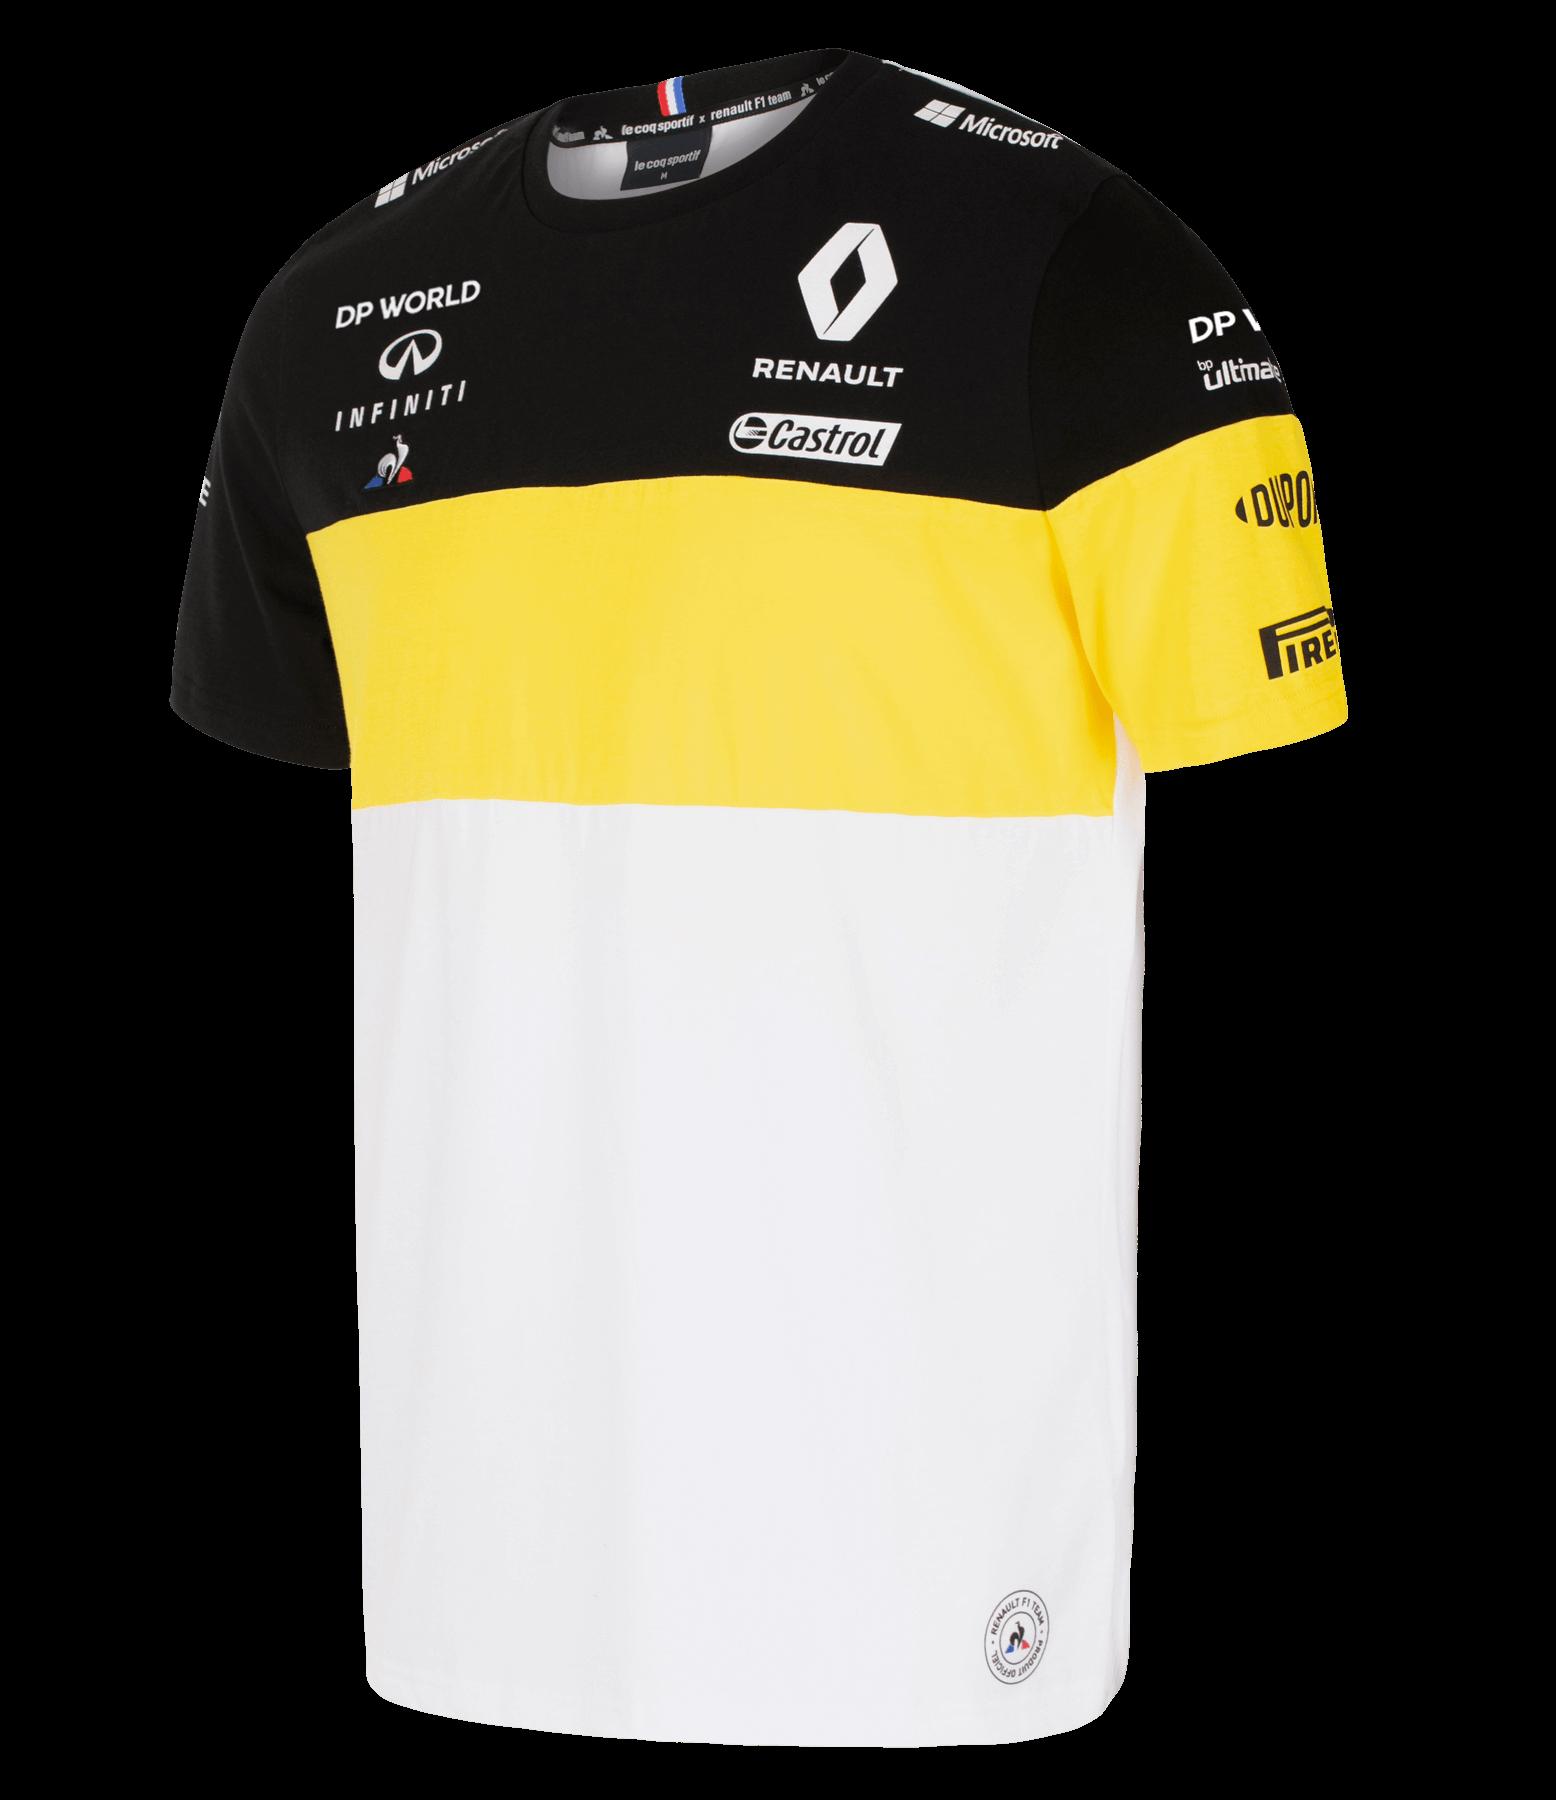 Renault Dp World F1 Team 2020 Men S T Shirt White Rs F1 Official Website